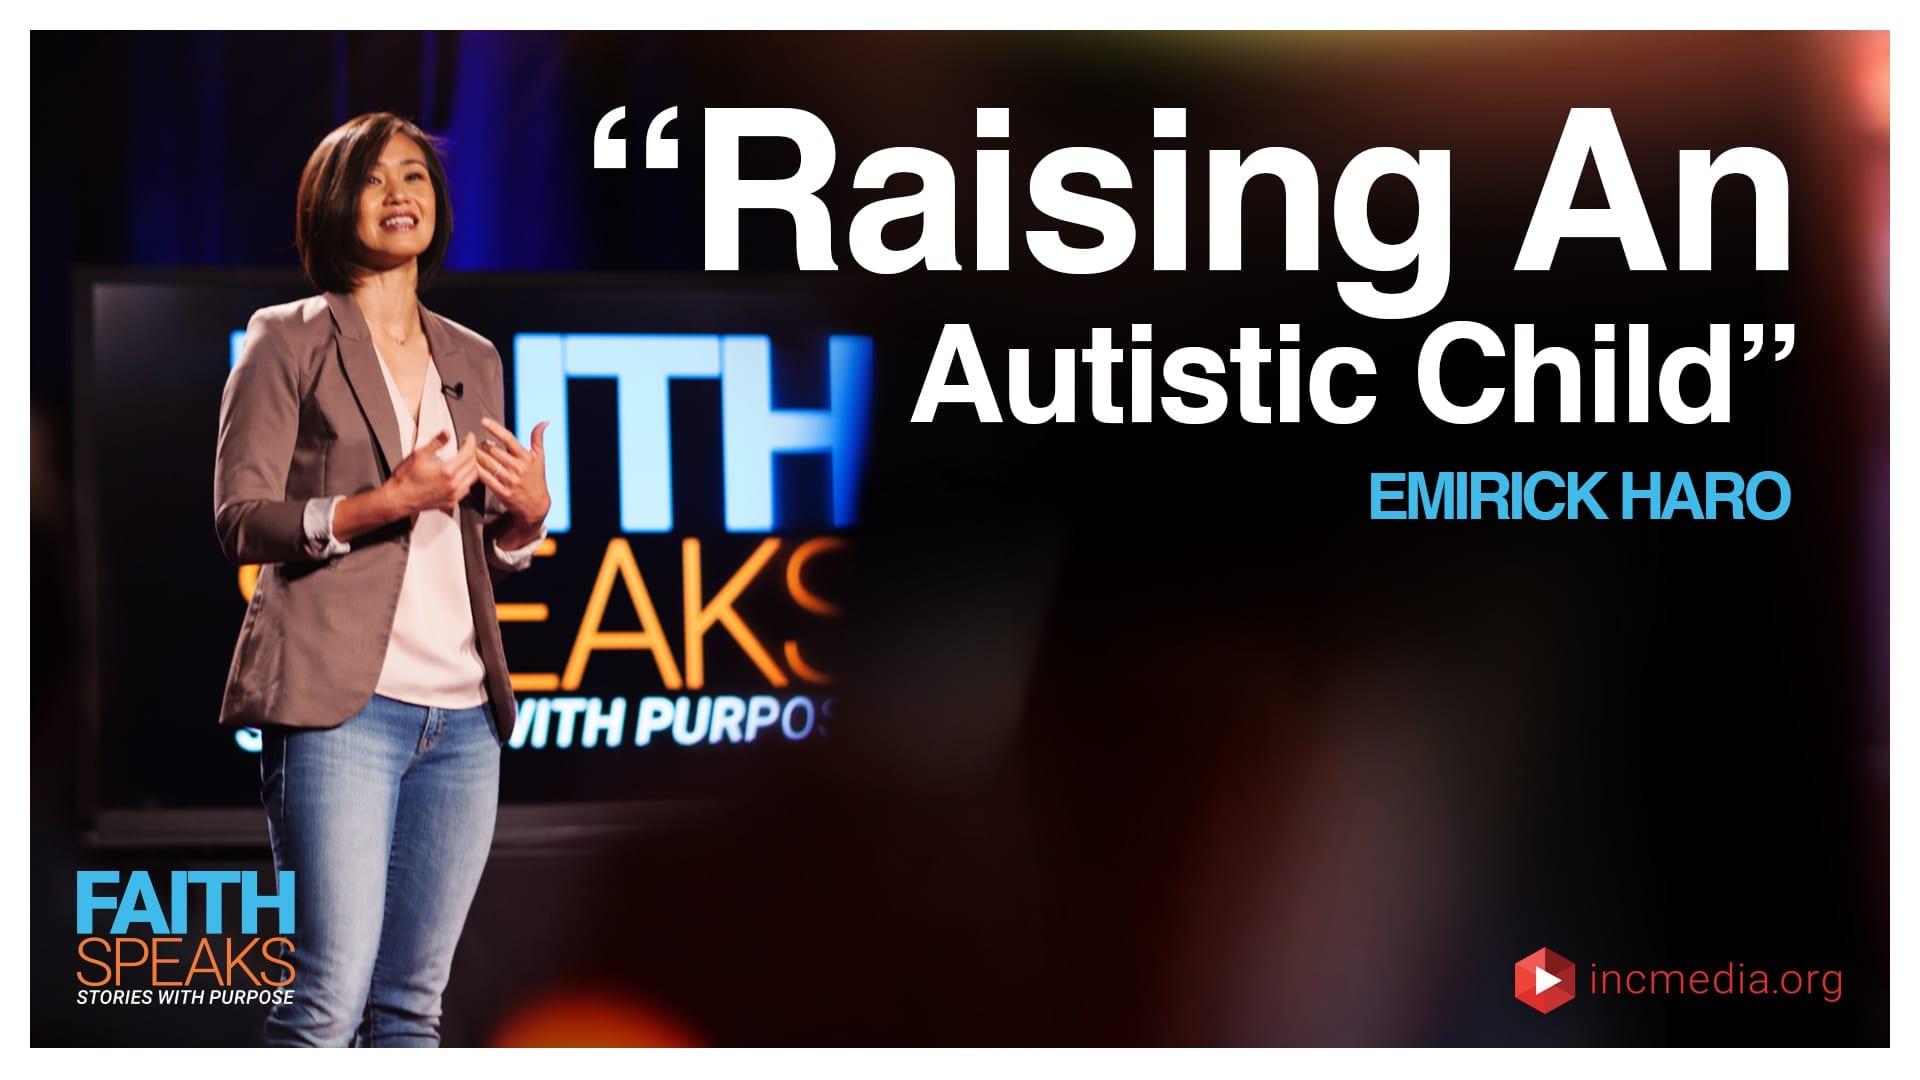 Emirick Haro: Raising an Autistic Child